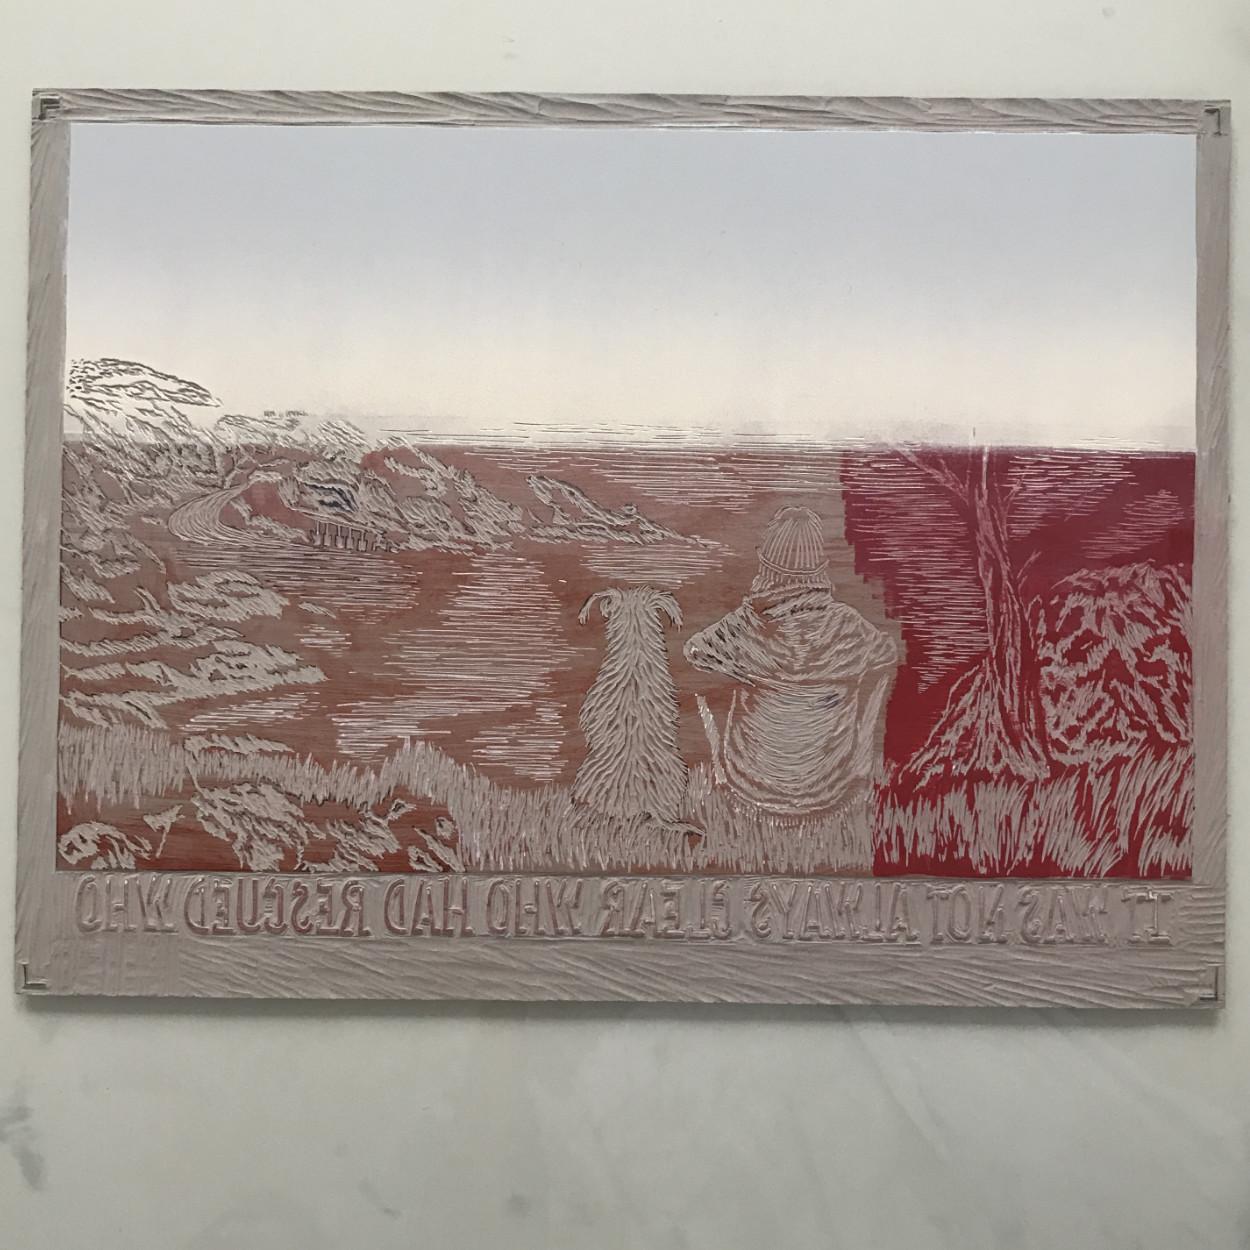 Inked linoprint for sky